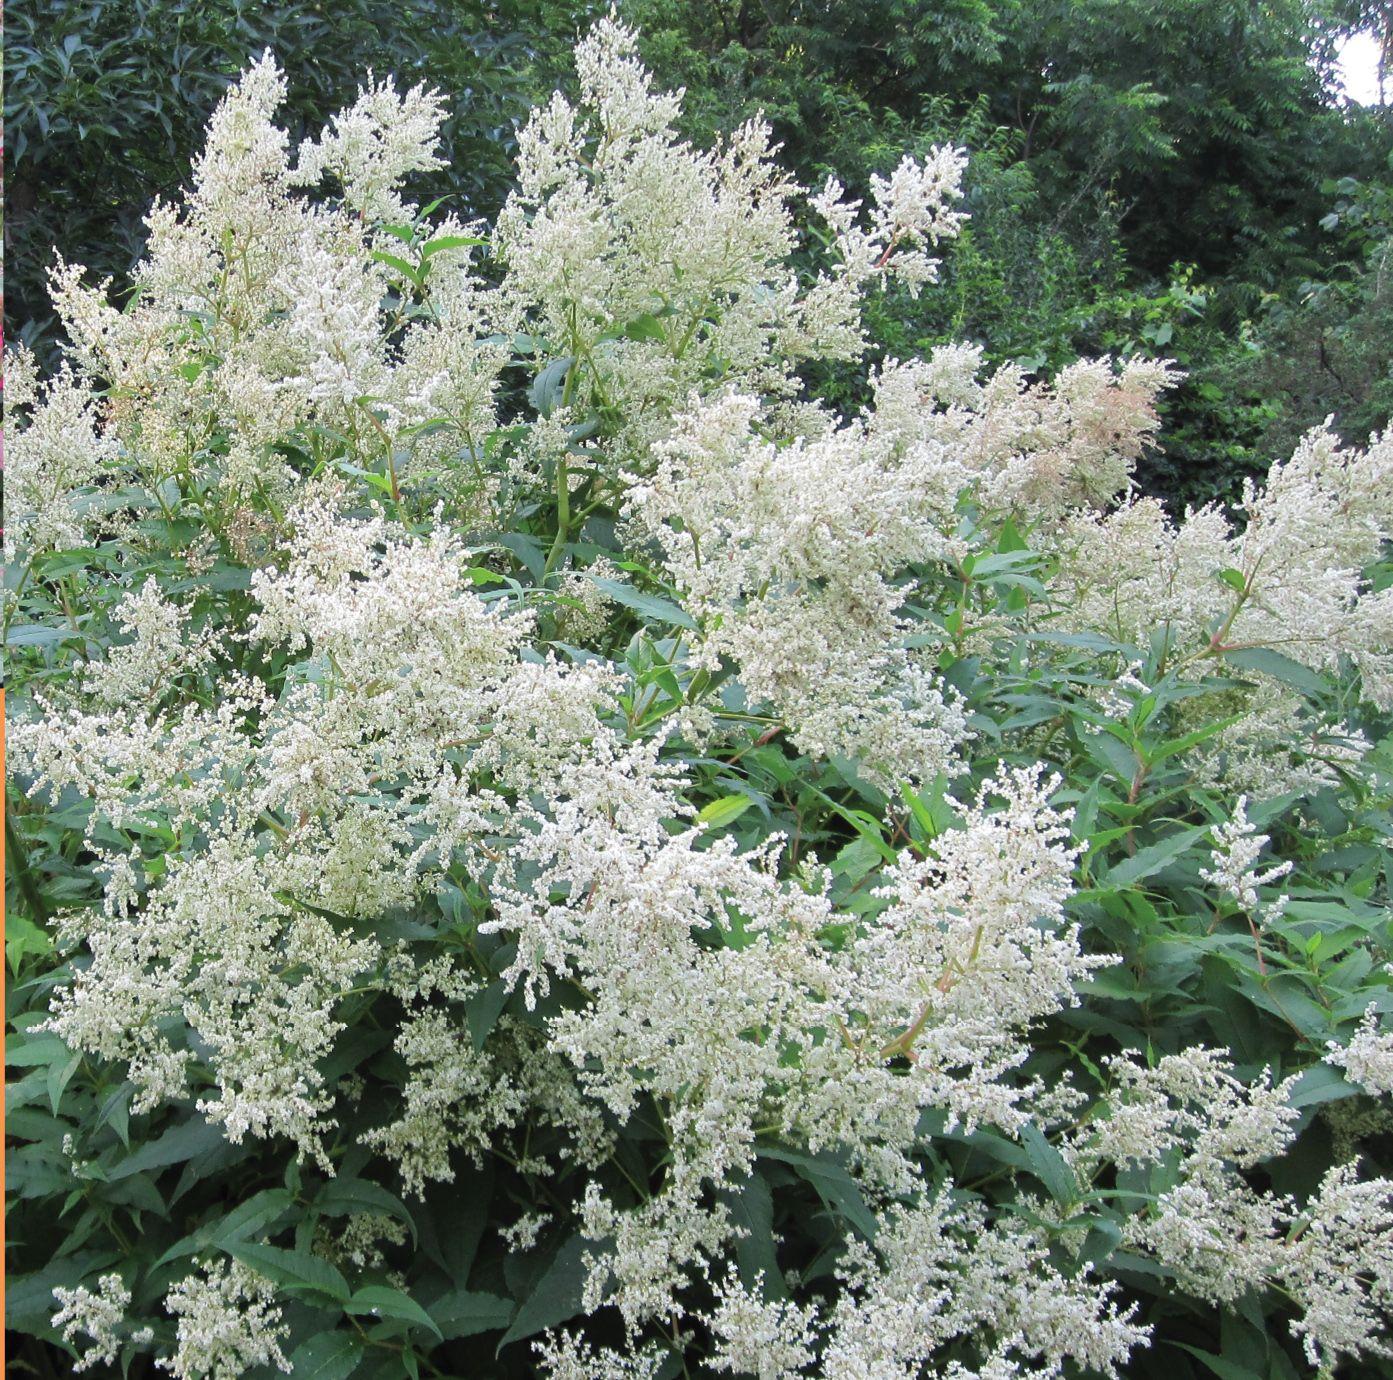 Giant Fleece Flower Persicaria Polymorpha Is An Underused